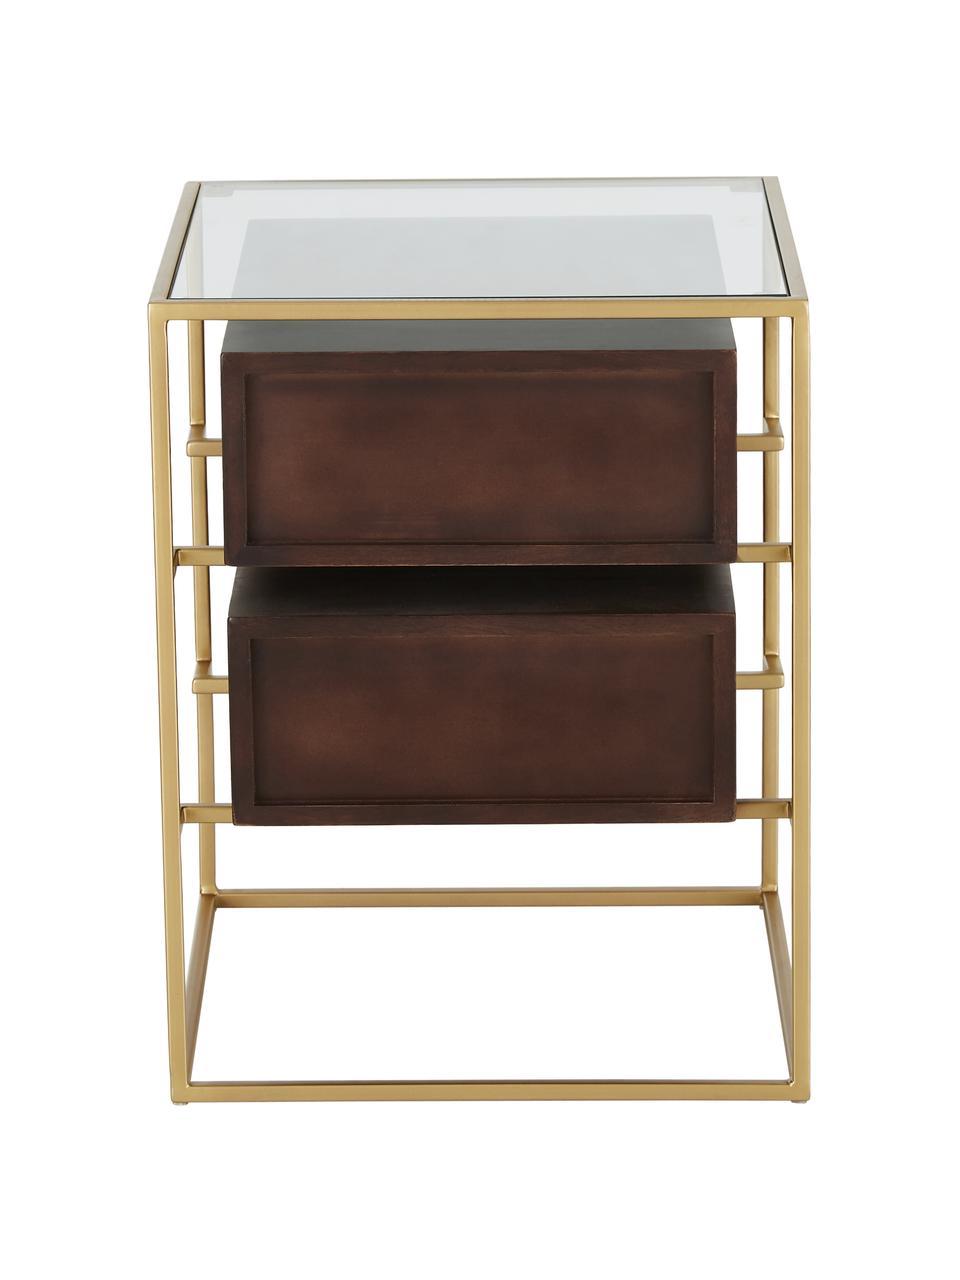 Nachtkastje Lyle met glazen blad, Plank: glas, Donker gelakt mangohout, 45 x 58 cm